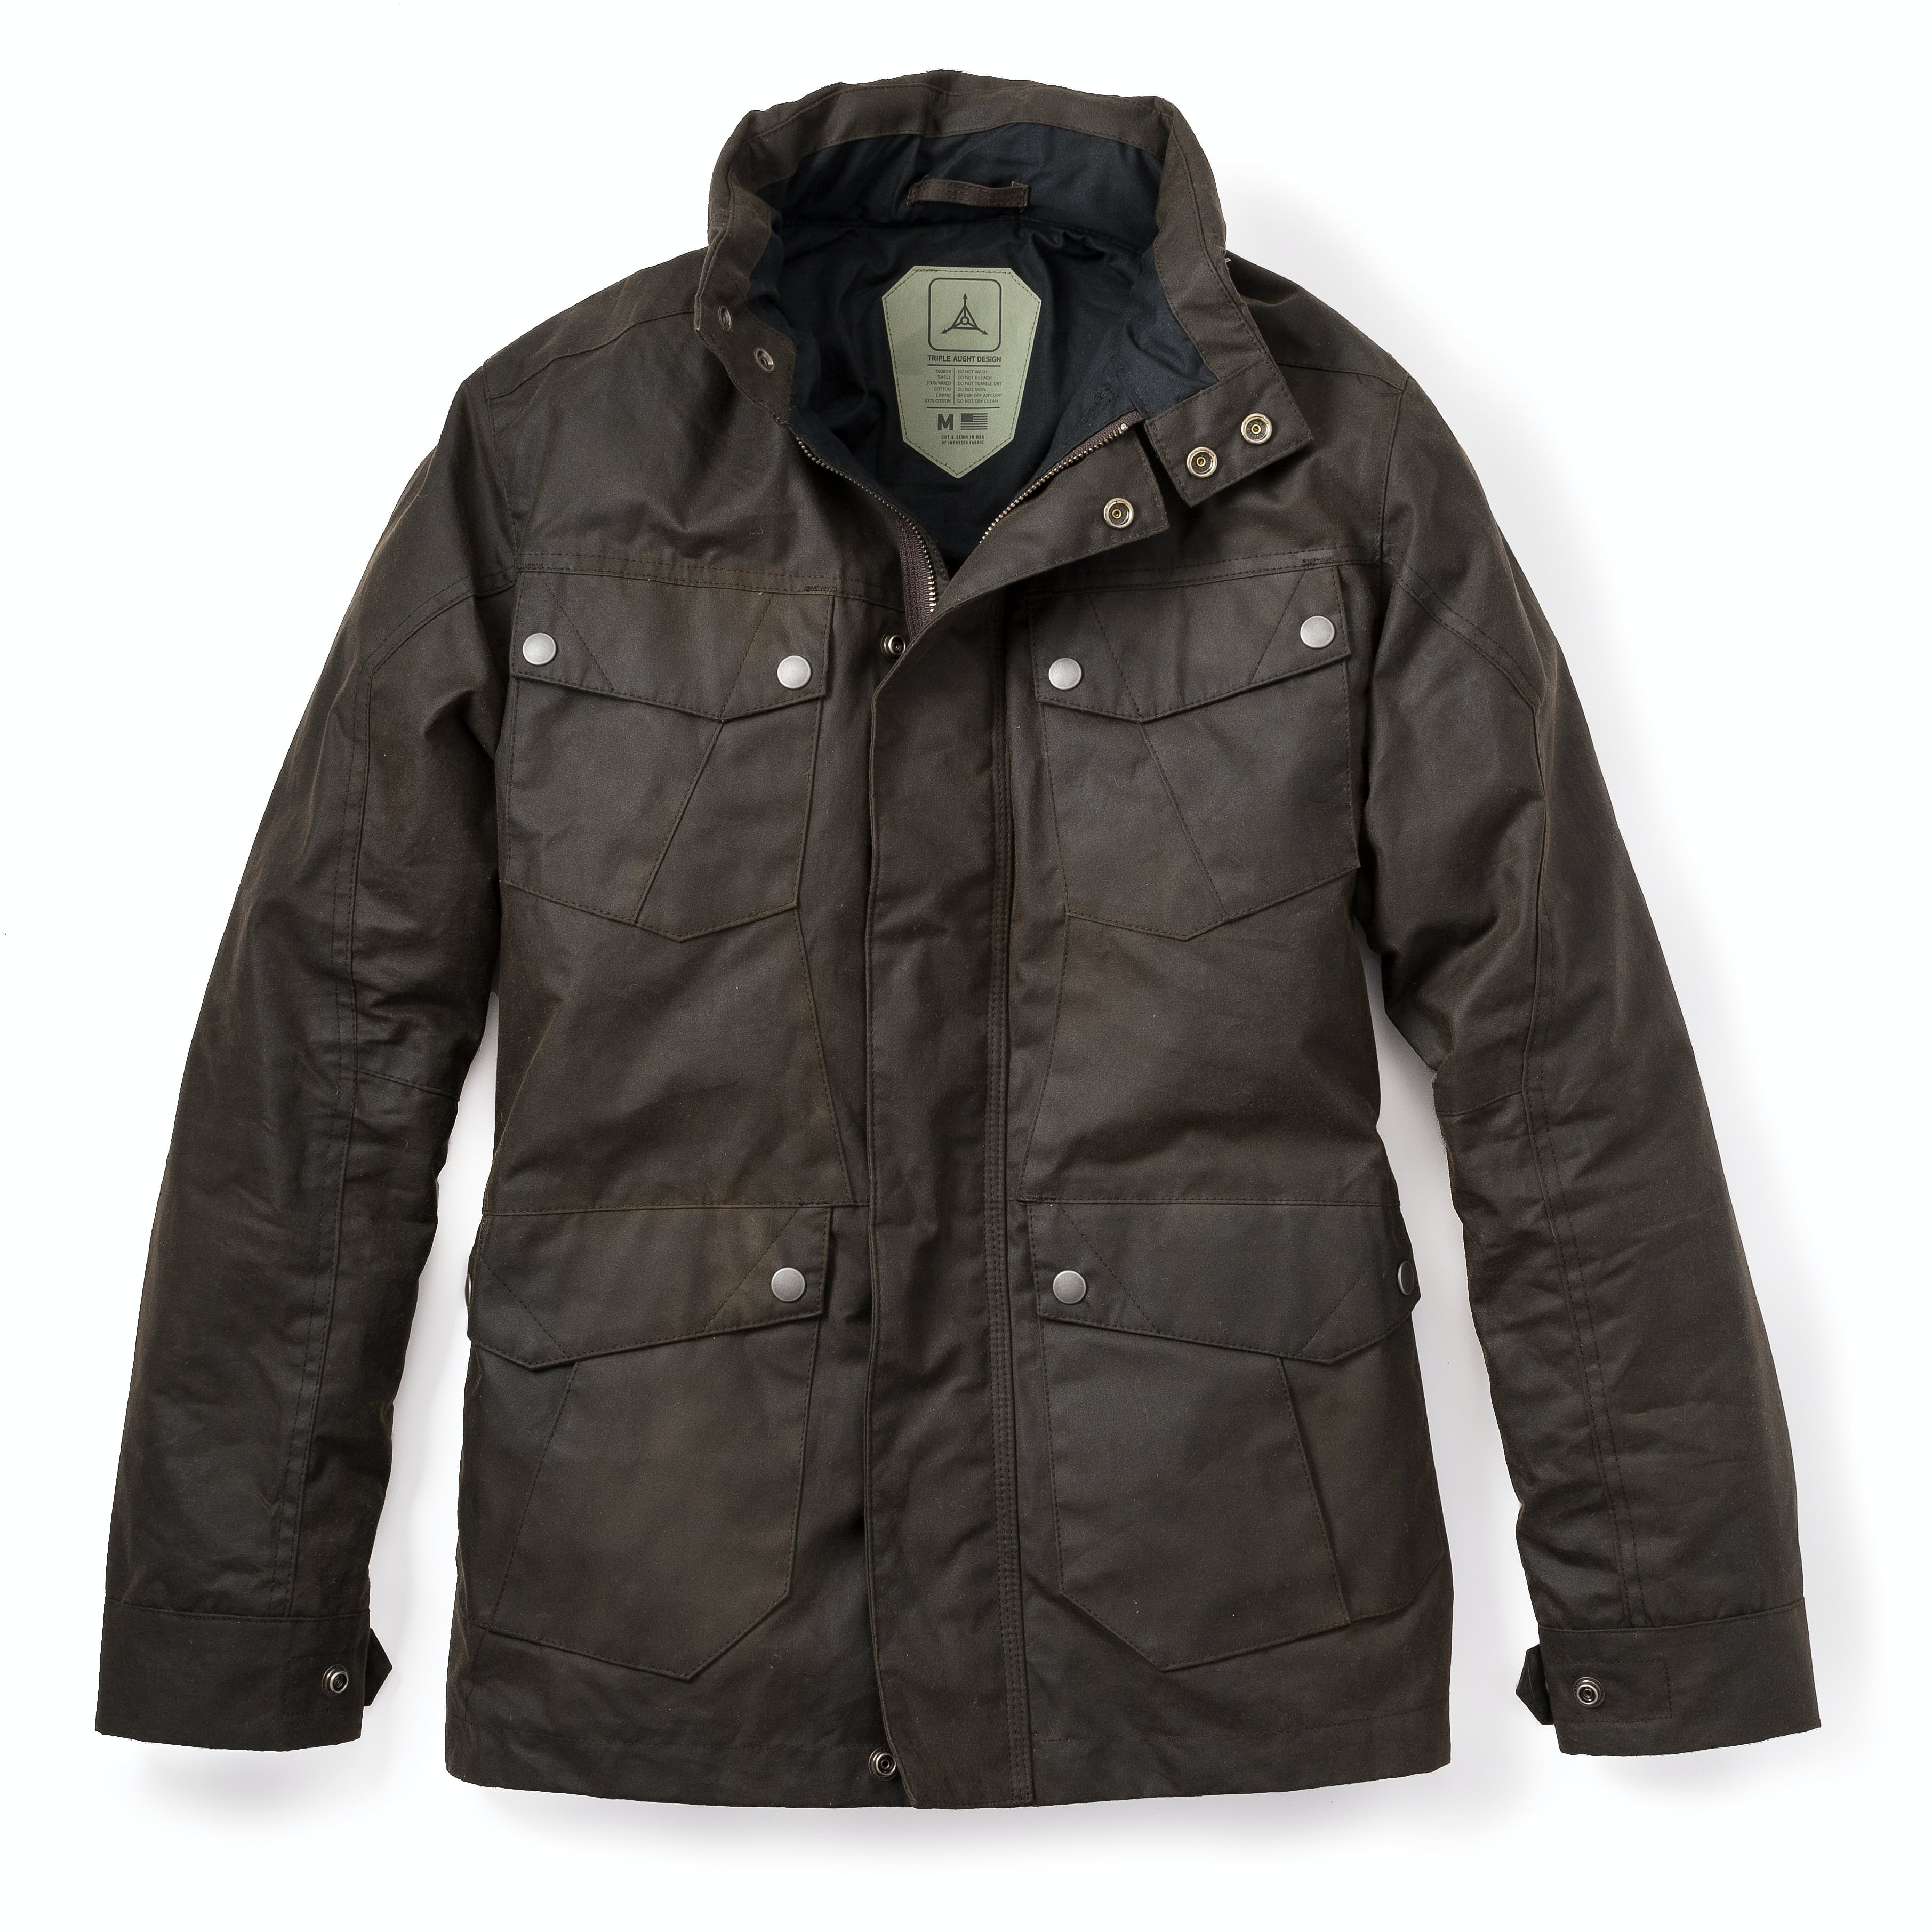 Yga2xp6kxm triple aught design talisman jacket 0 original